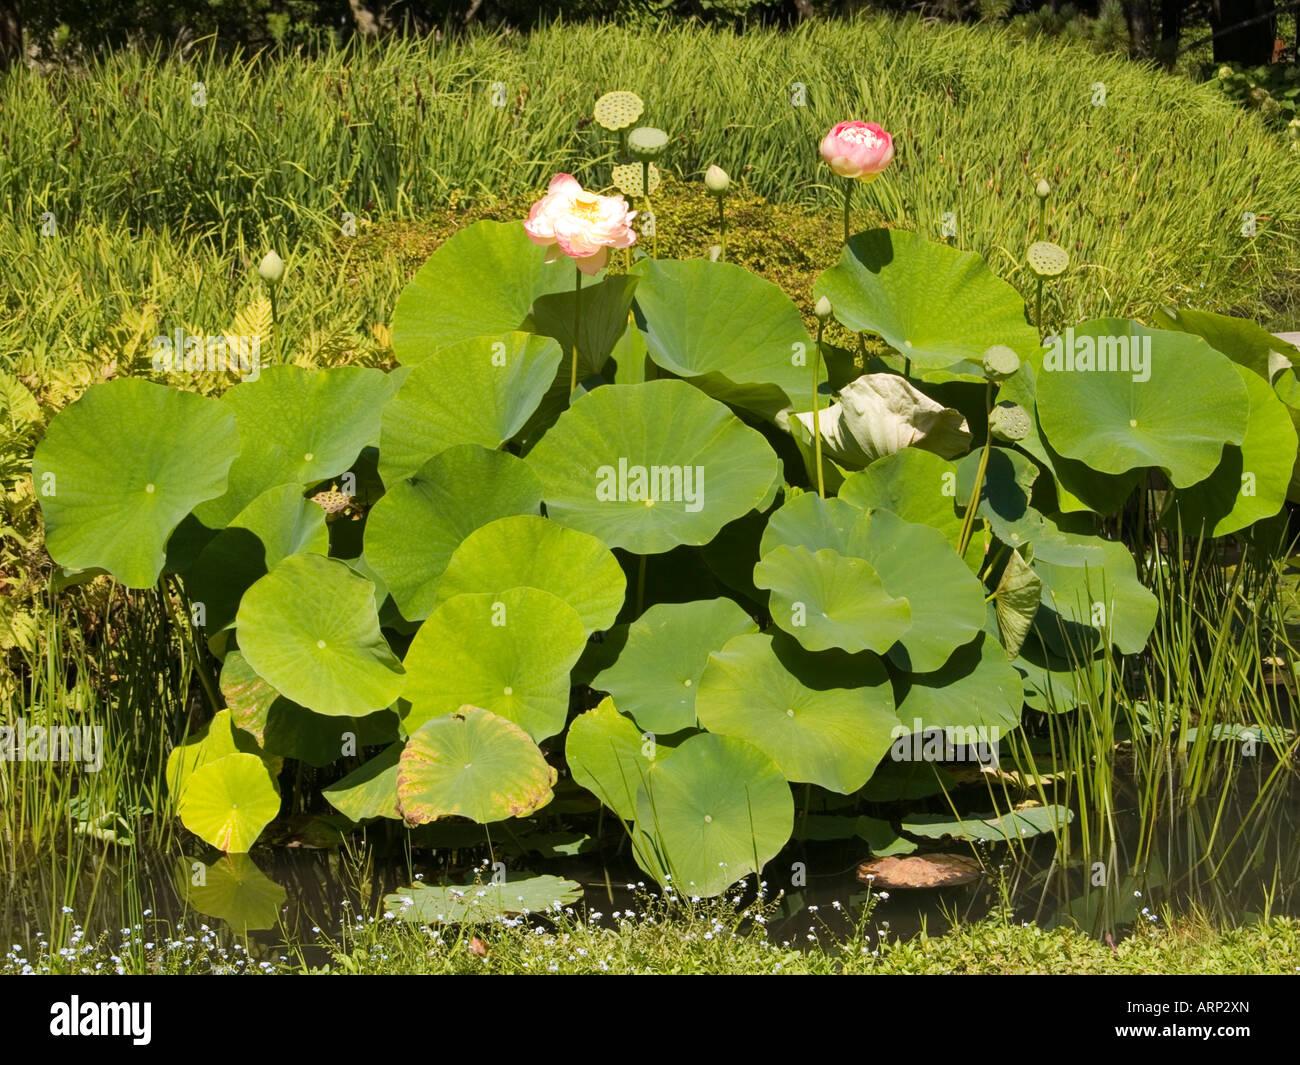 Plants In The Japanese Water Garden At The Jardin Botanique De